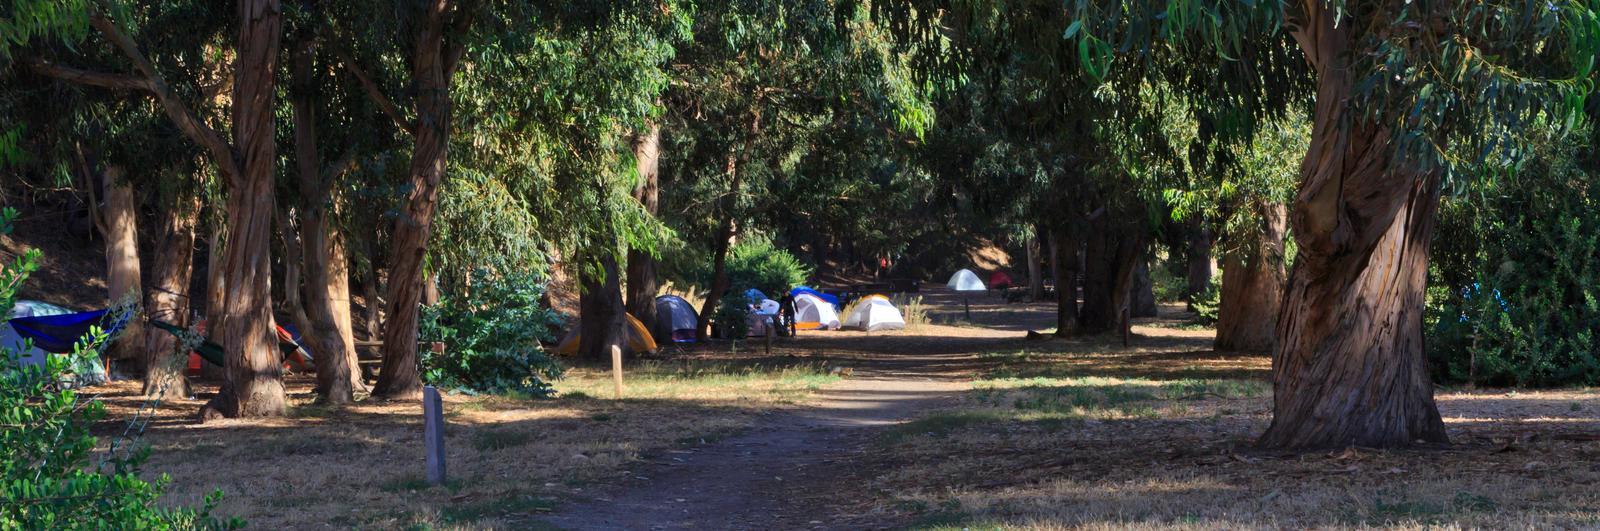 Tents in forested area.Santa Cruz Scorpion